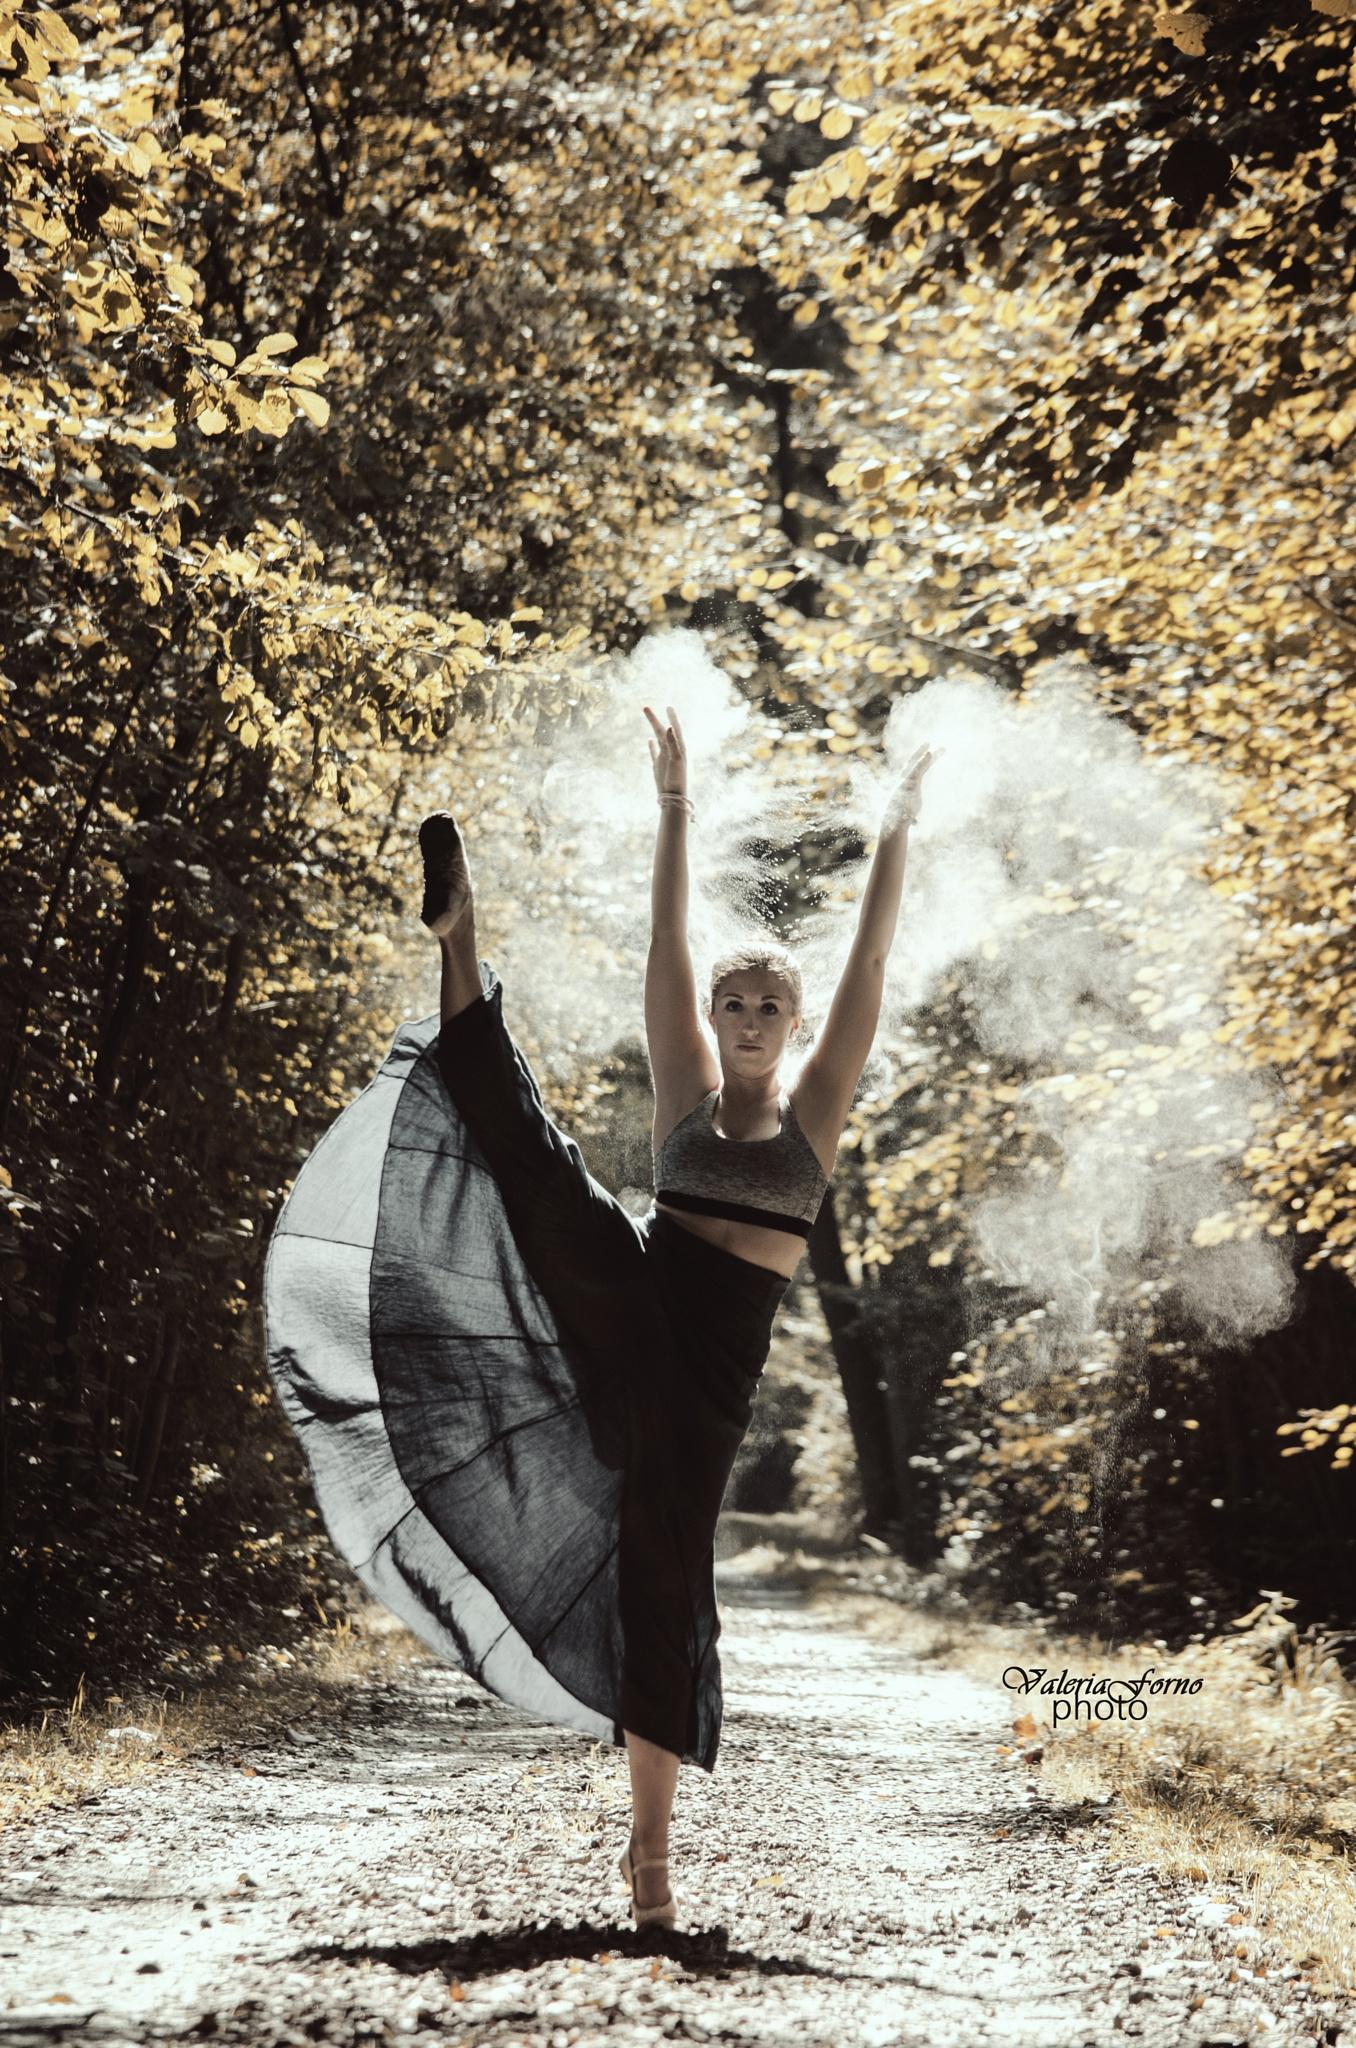 Magic dancer by Valeria Forno